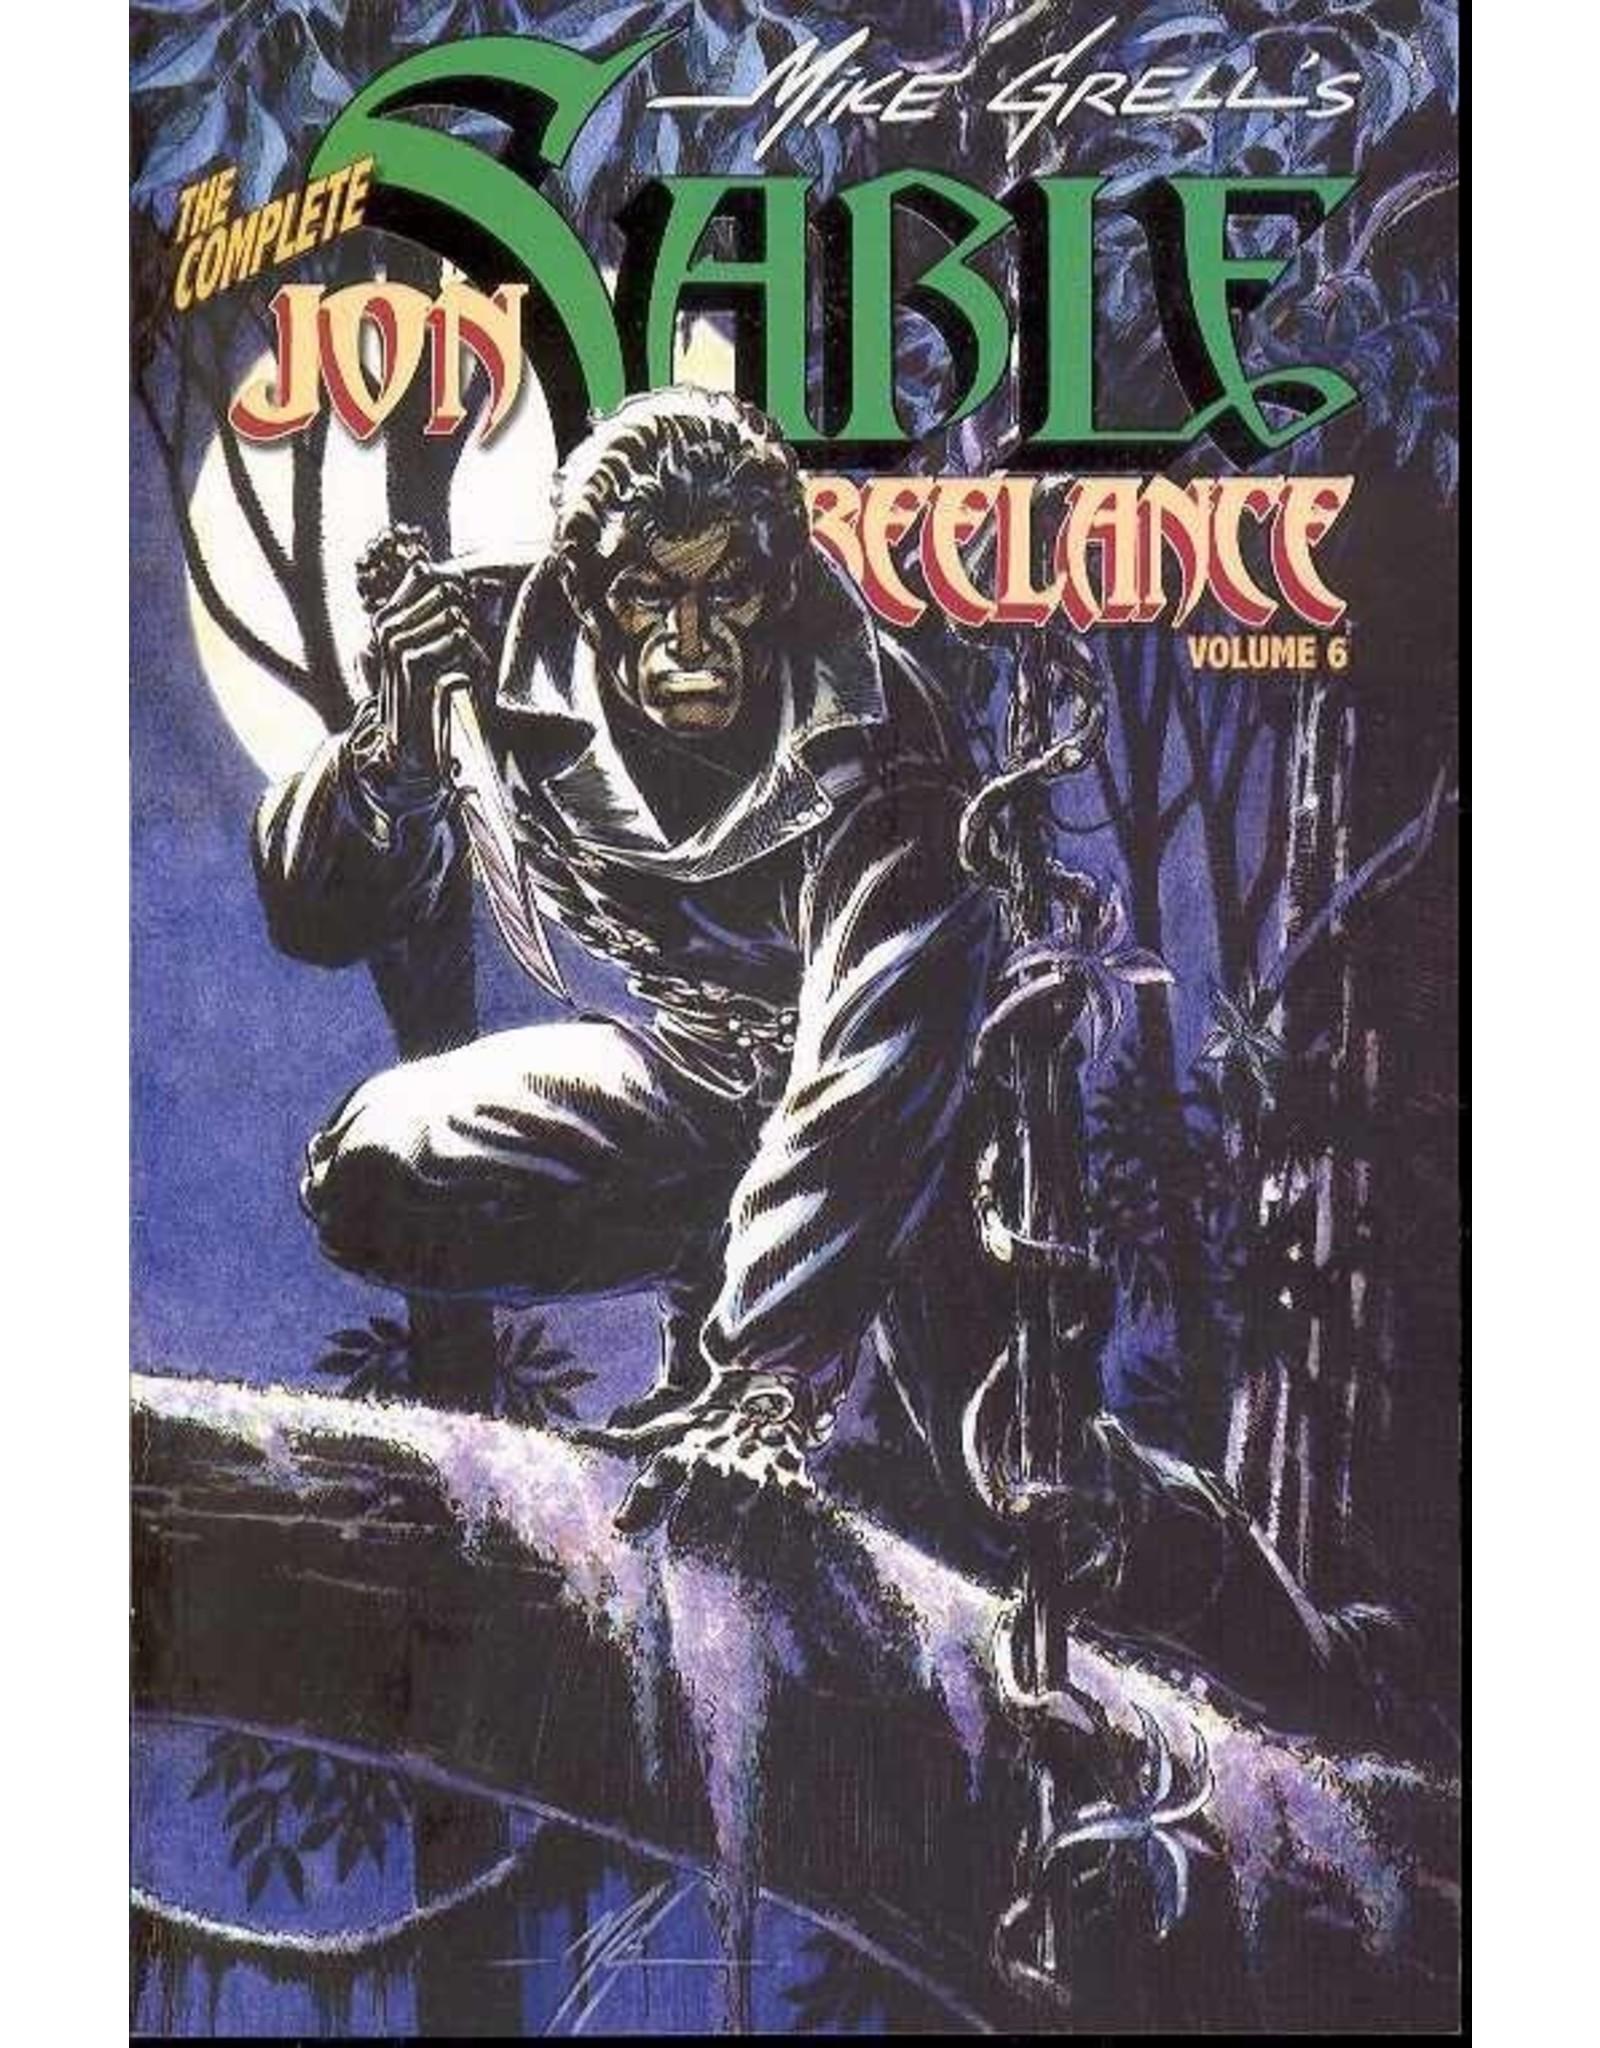 COMPLETE JON SABLE FREELANCE TP VOL 6